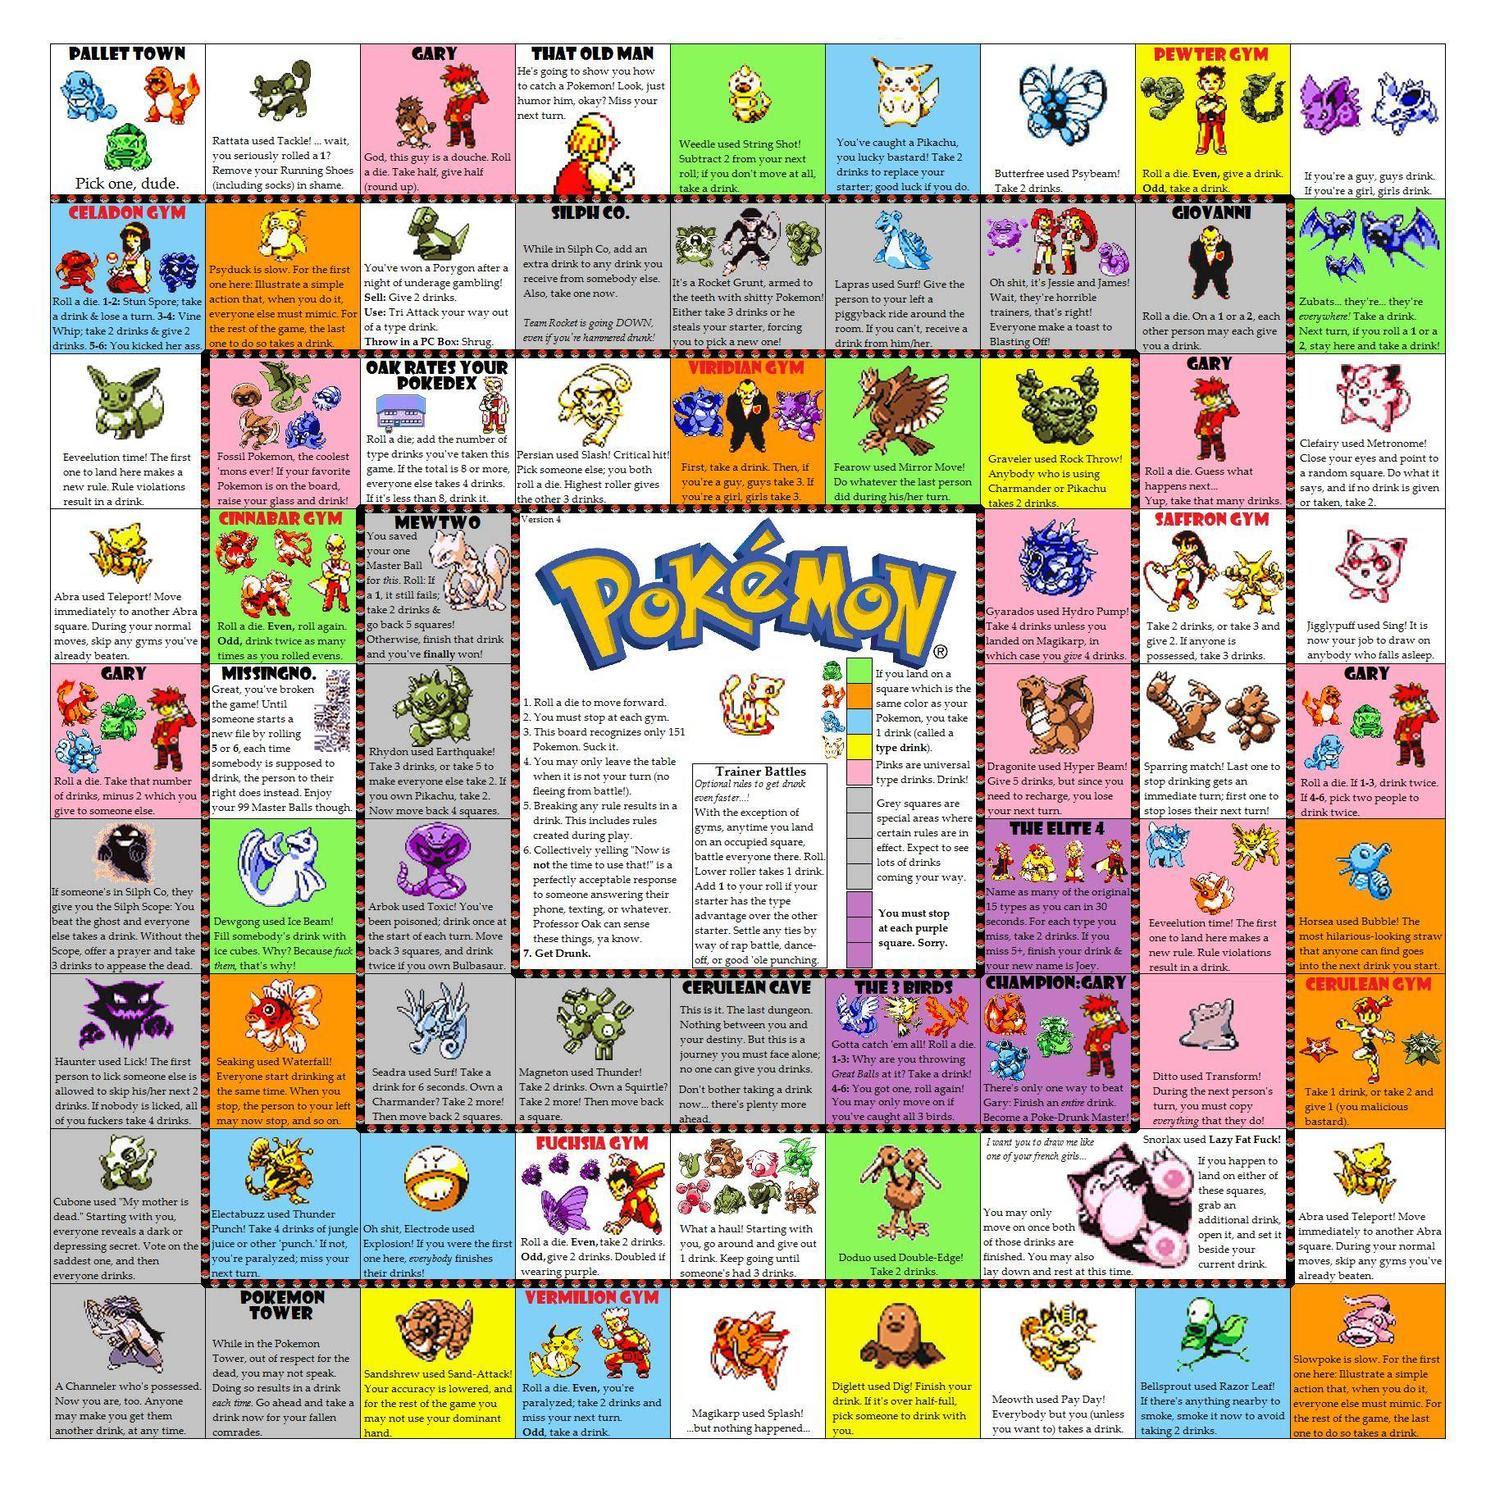 Pokemon Drinking Board Game Printable Images  Pokemon Images